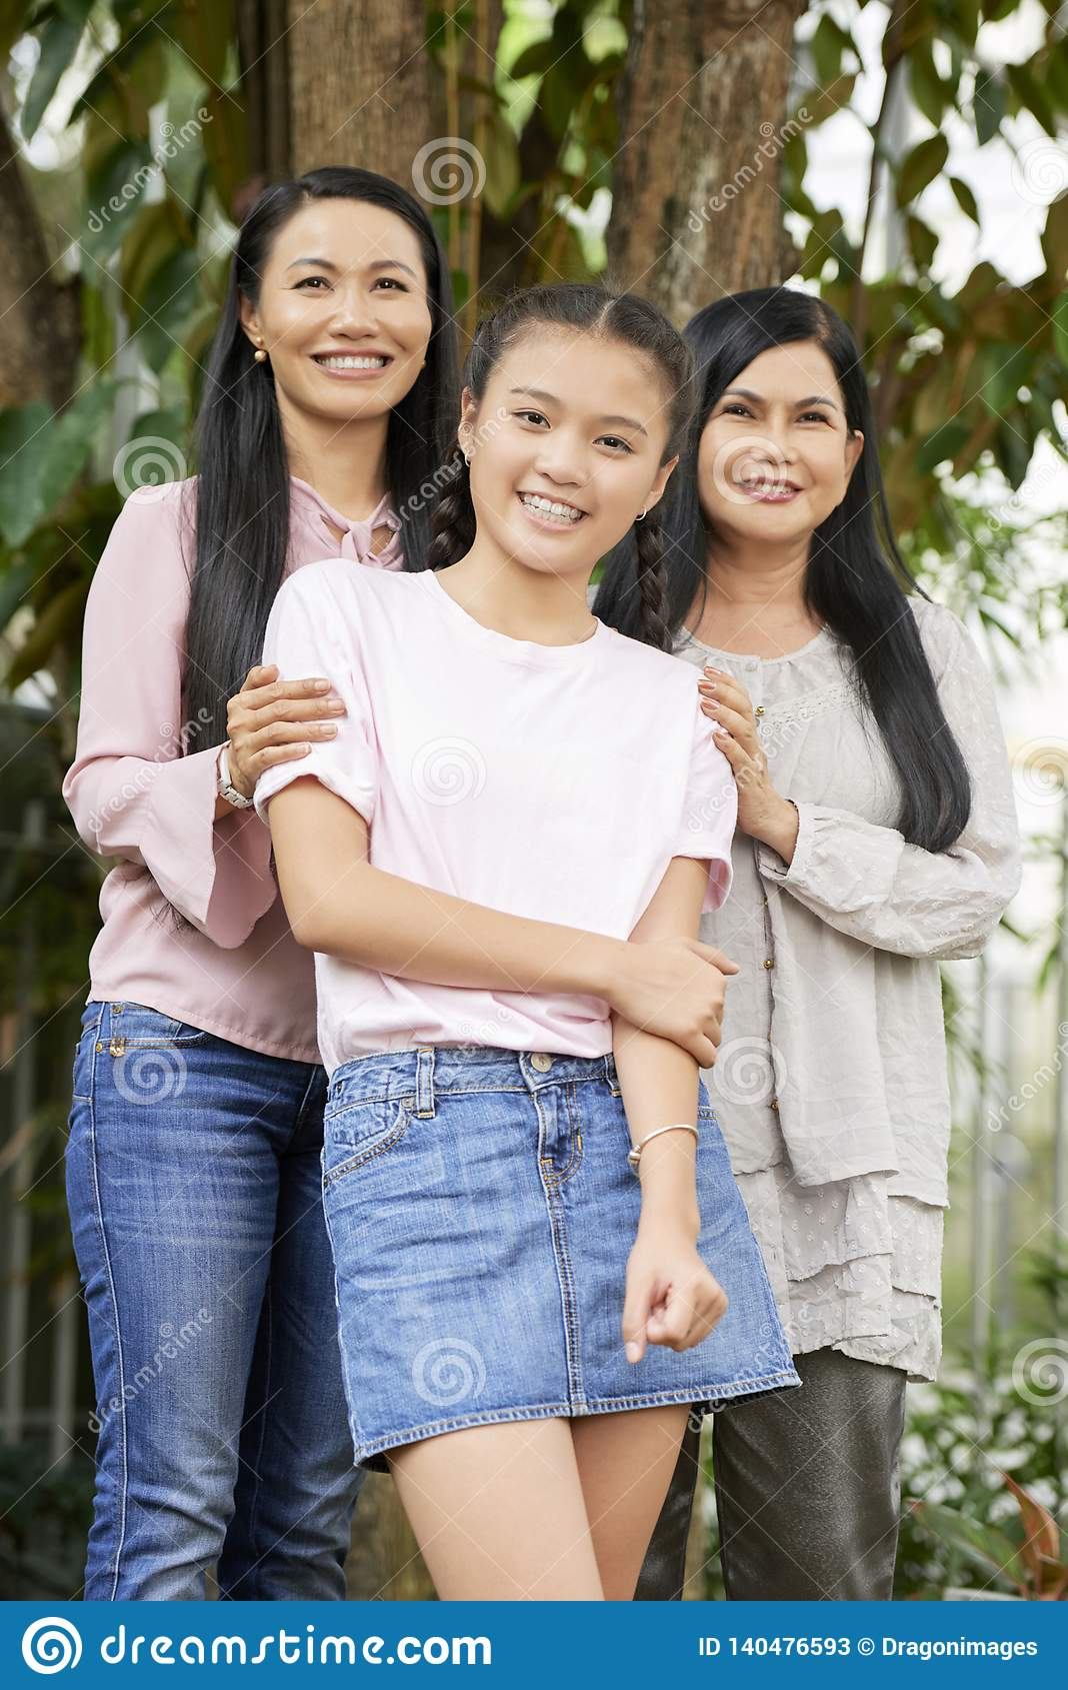 Teenage girl with mother and grandmother